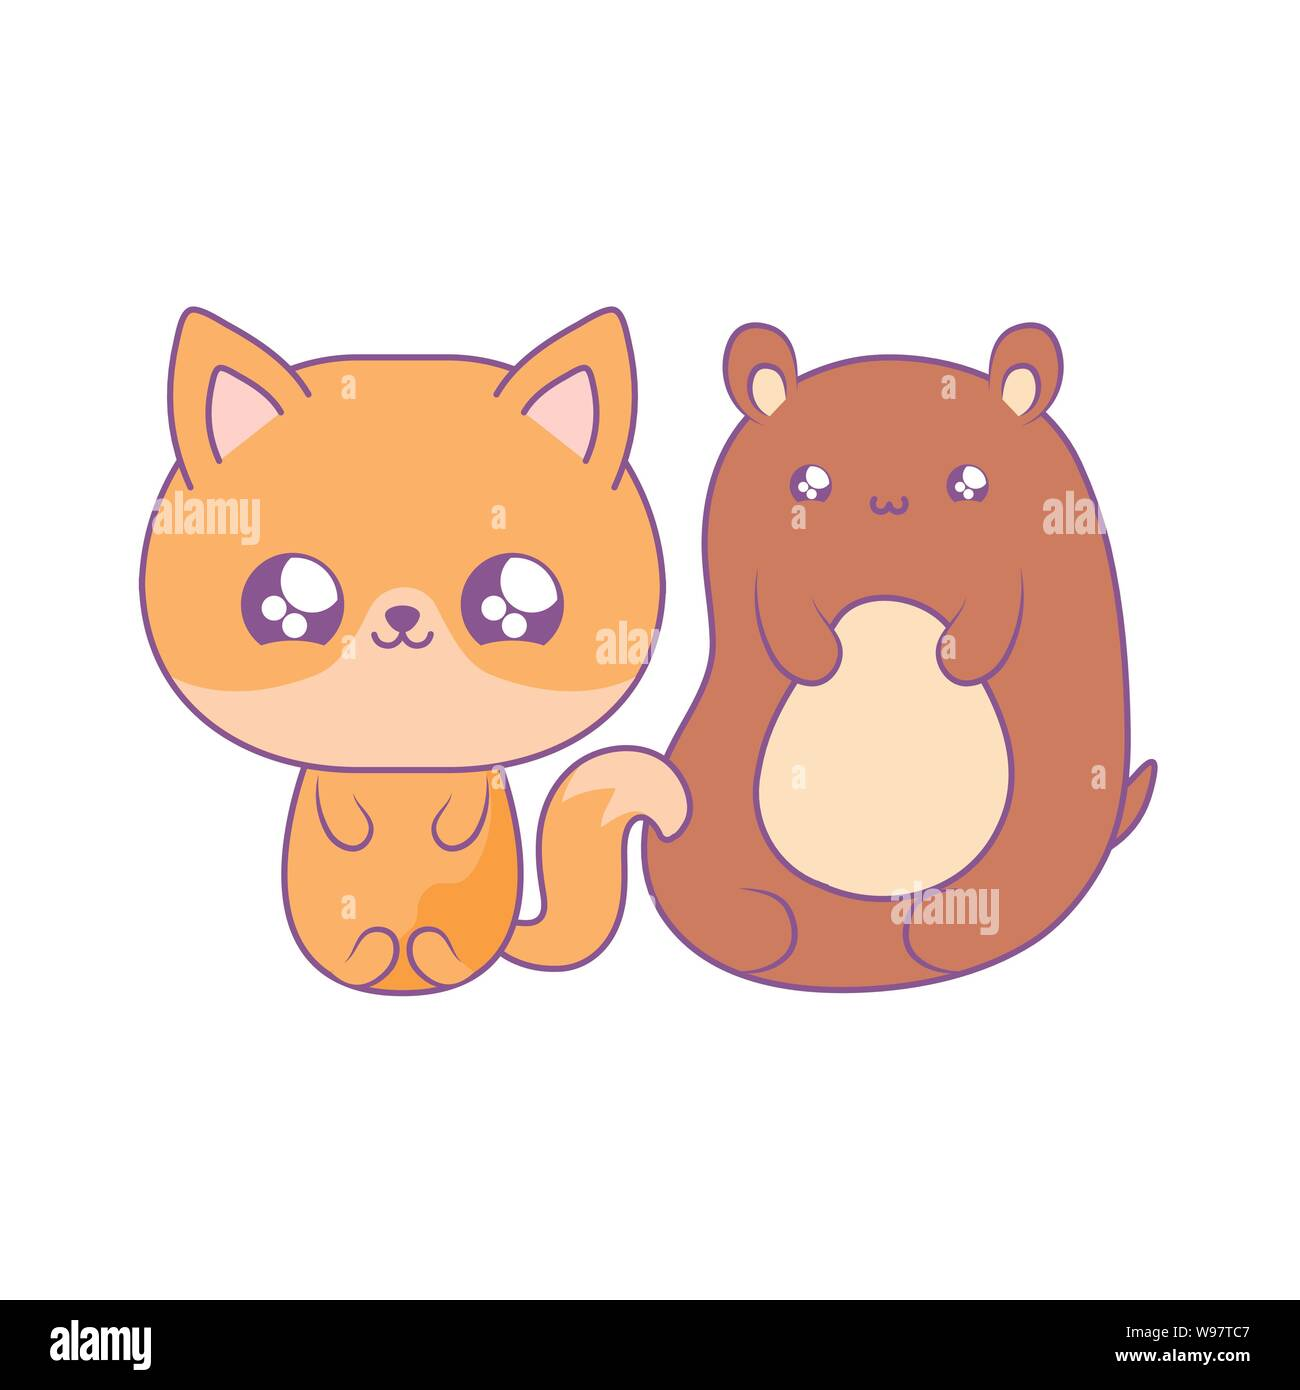 Cute Bear With Fox Baby Animals Kawaii Style Vector Illustration Design Stock Vector Image Art Alamy